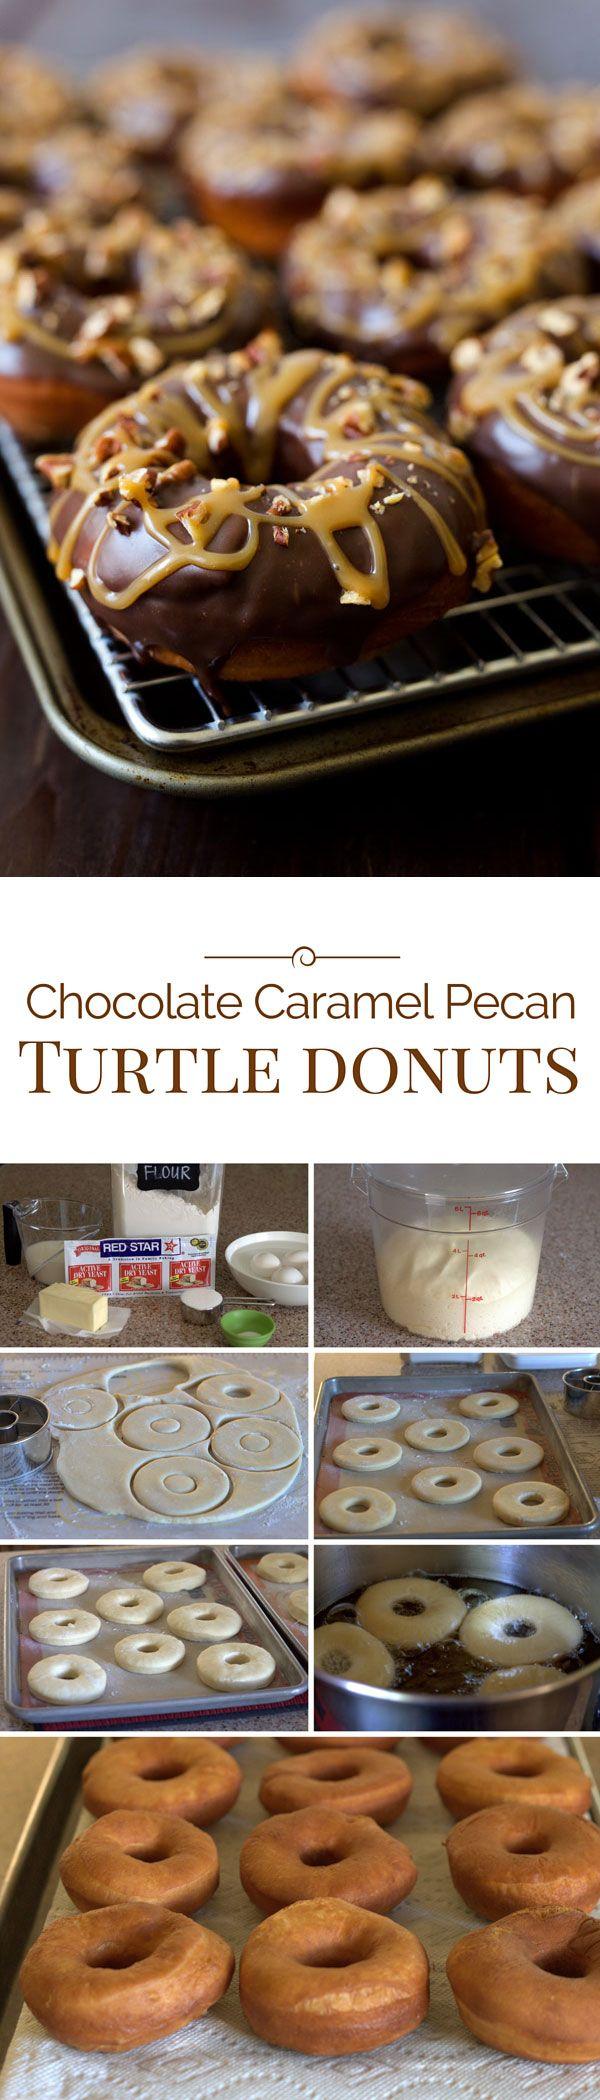 Chocolate Caramel Pecan Turtle Donuts